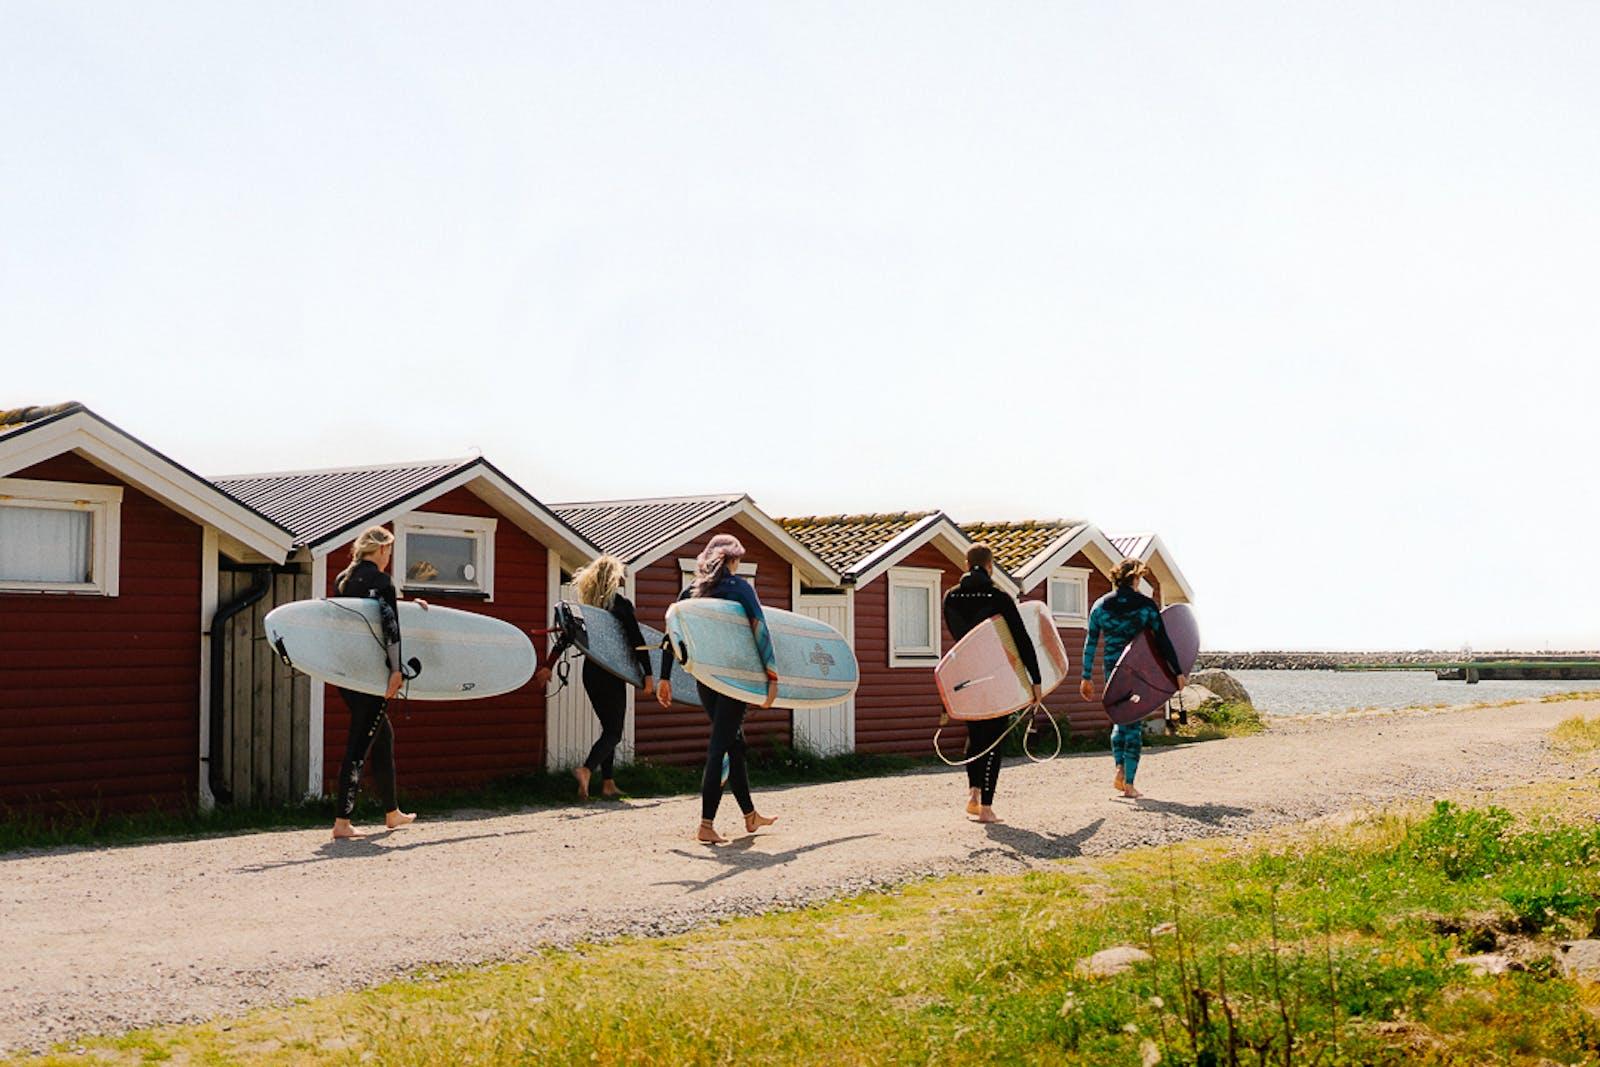 Surf i Halland